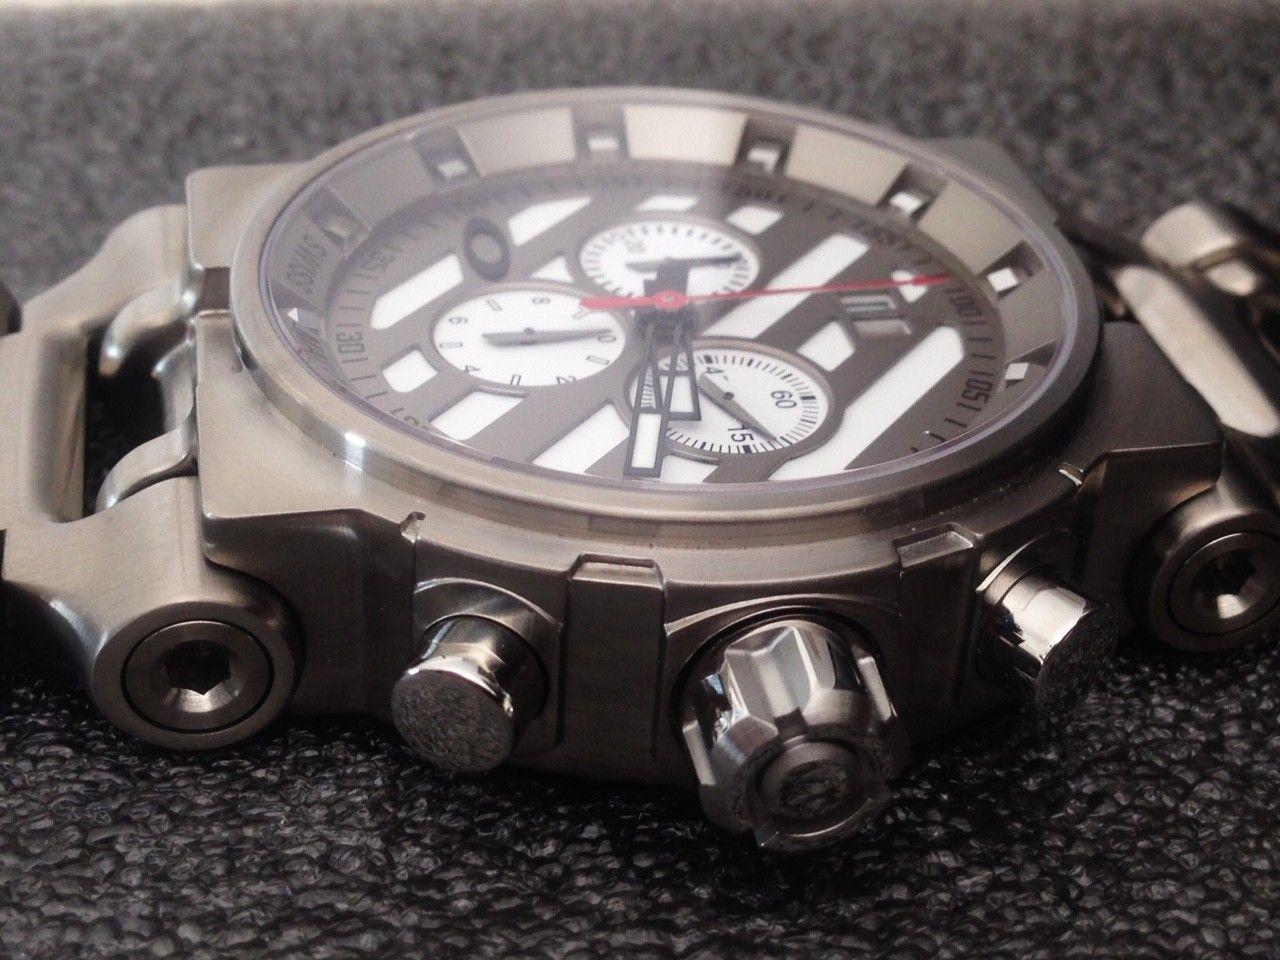 NEW IN BOX Oakley Hollow Point Titanium Watch White Dial 10-046 - 5.JPG